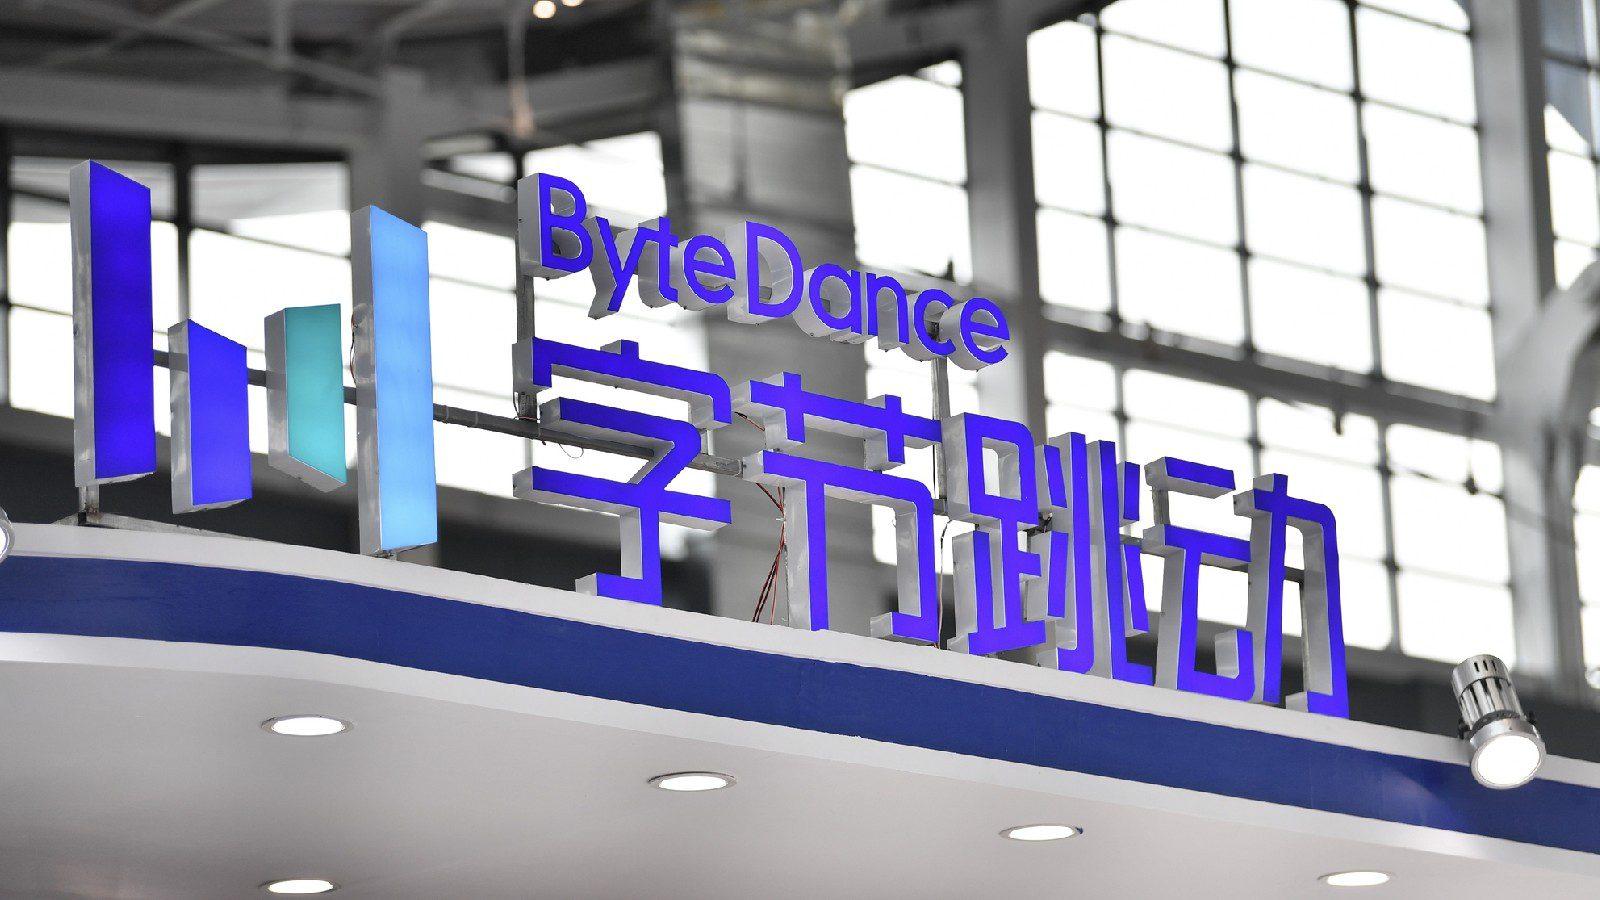 Bytedance Application